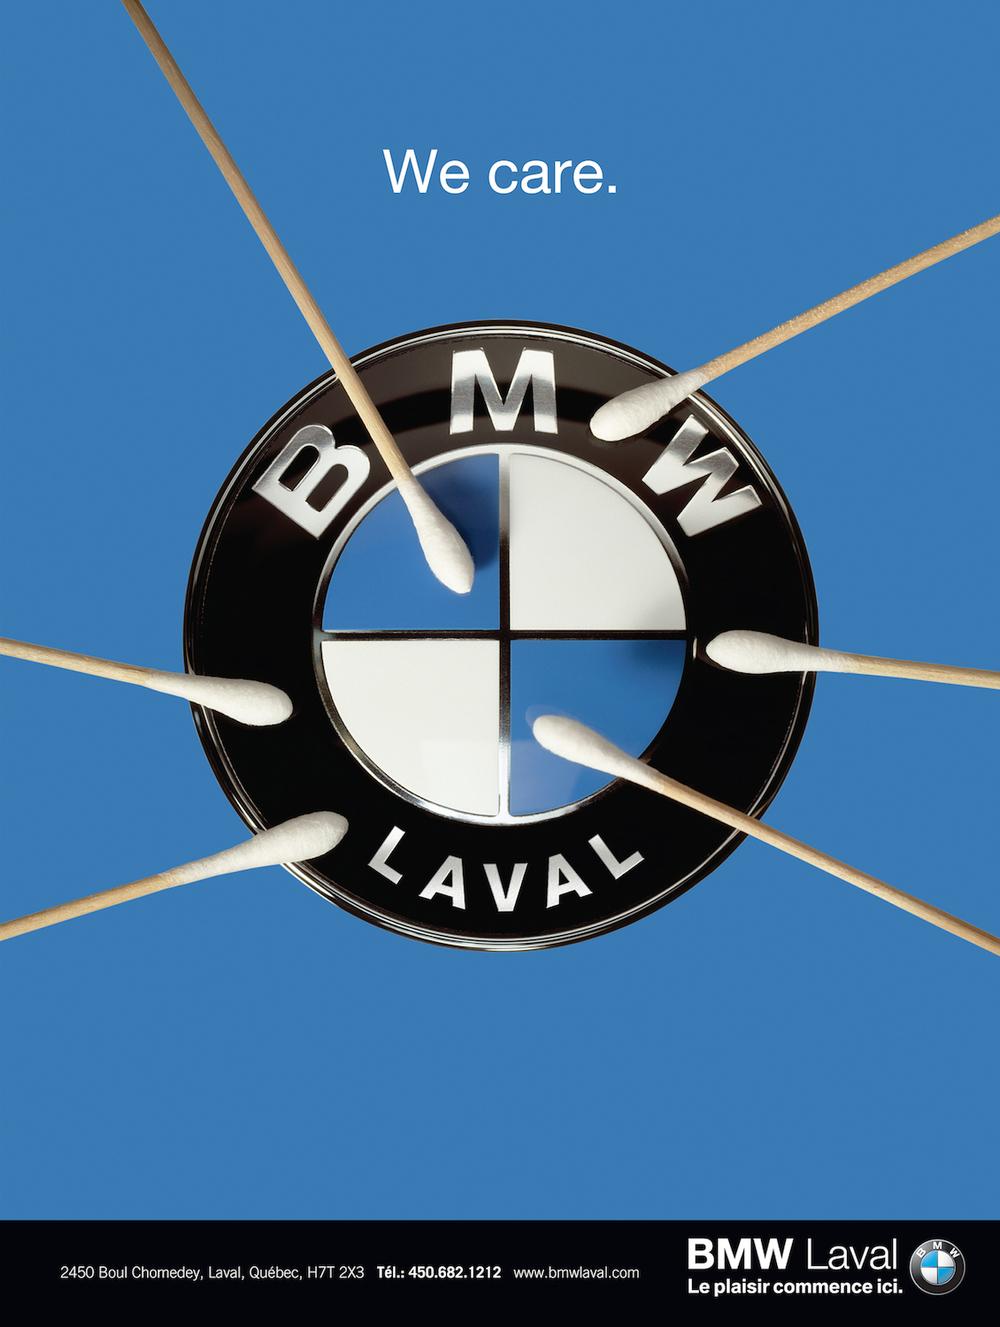 16 BMW Q tips .jpg